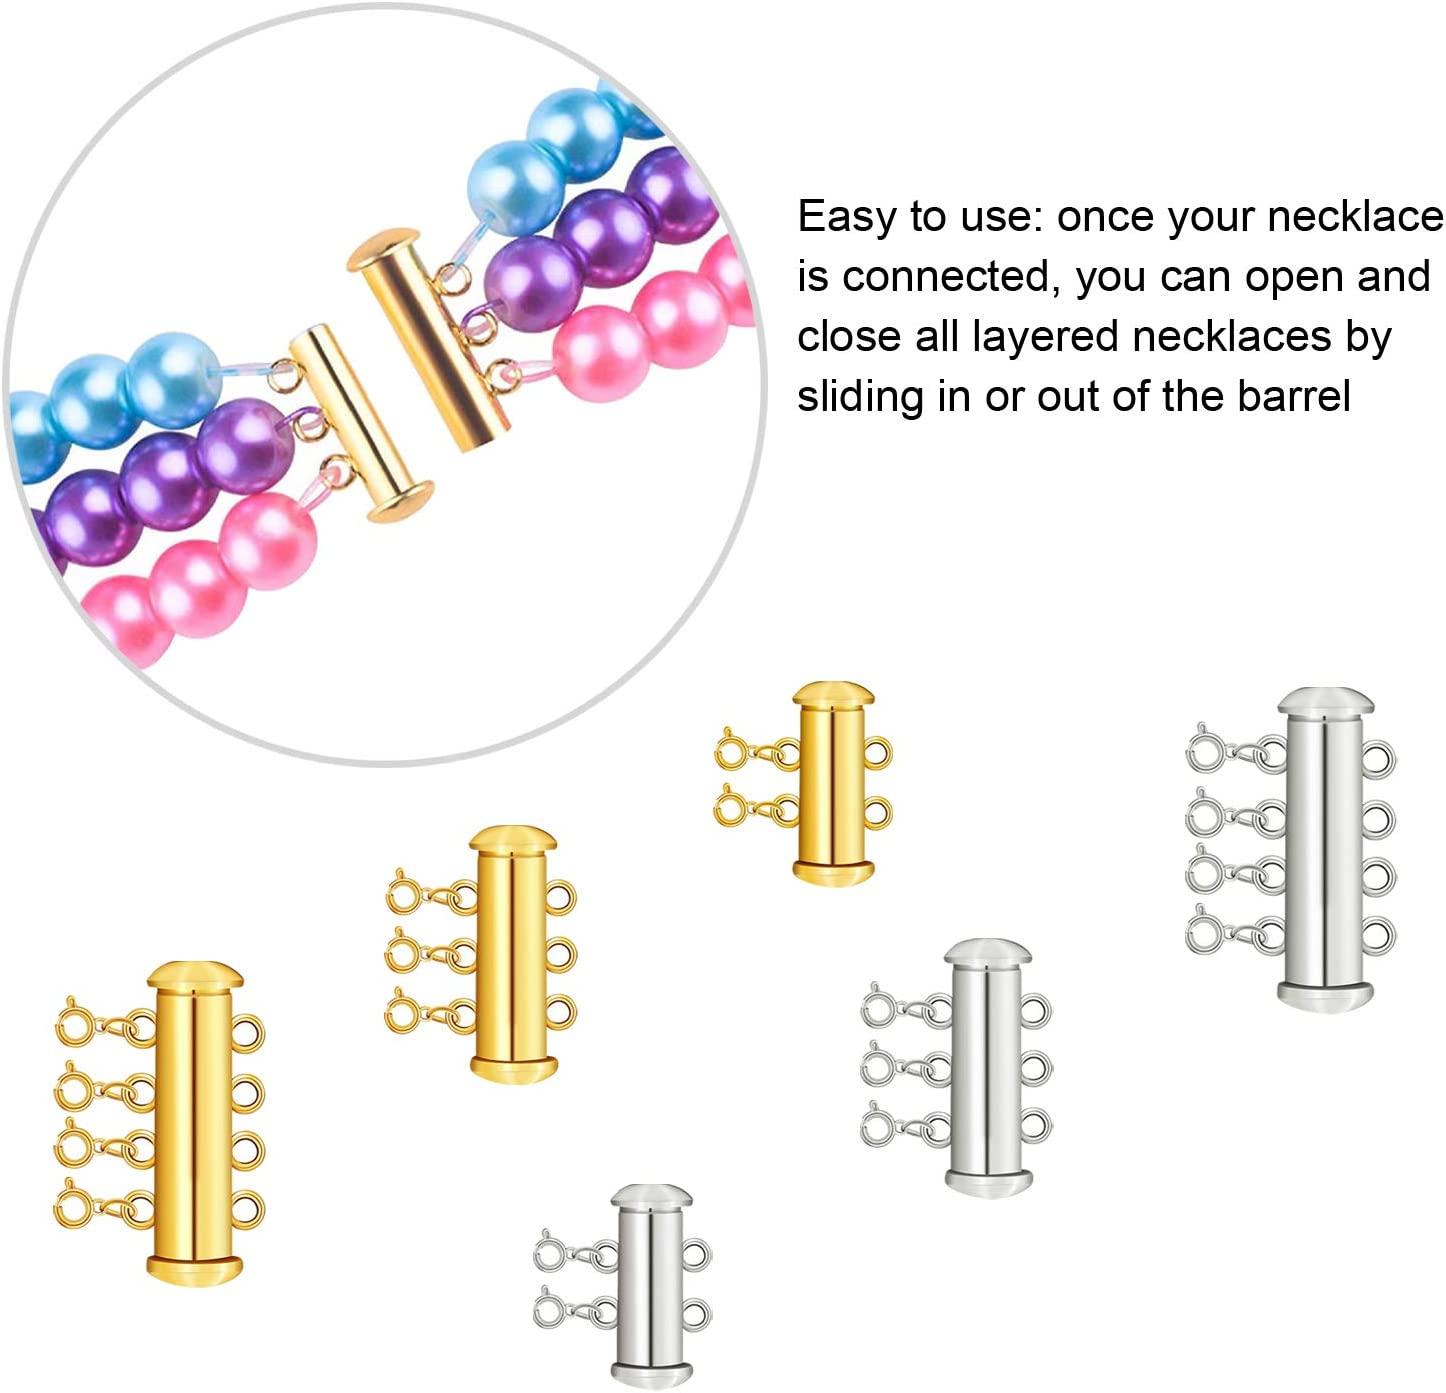 Slide Magnetic Necklace Clasp Connectors Tube Multi Strands Clasps Edivoi 18PCS Magnetic Clasps for Necklaces and Bracelets Stainless Steel Necklace Bracelet Extender Chain Set